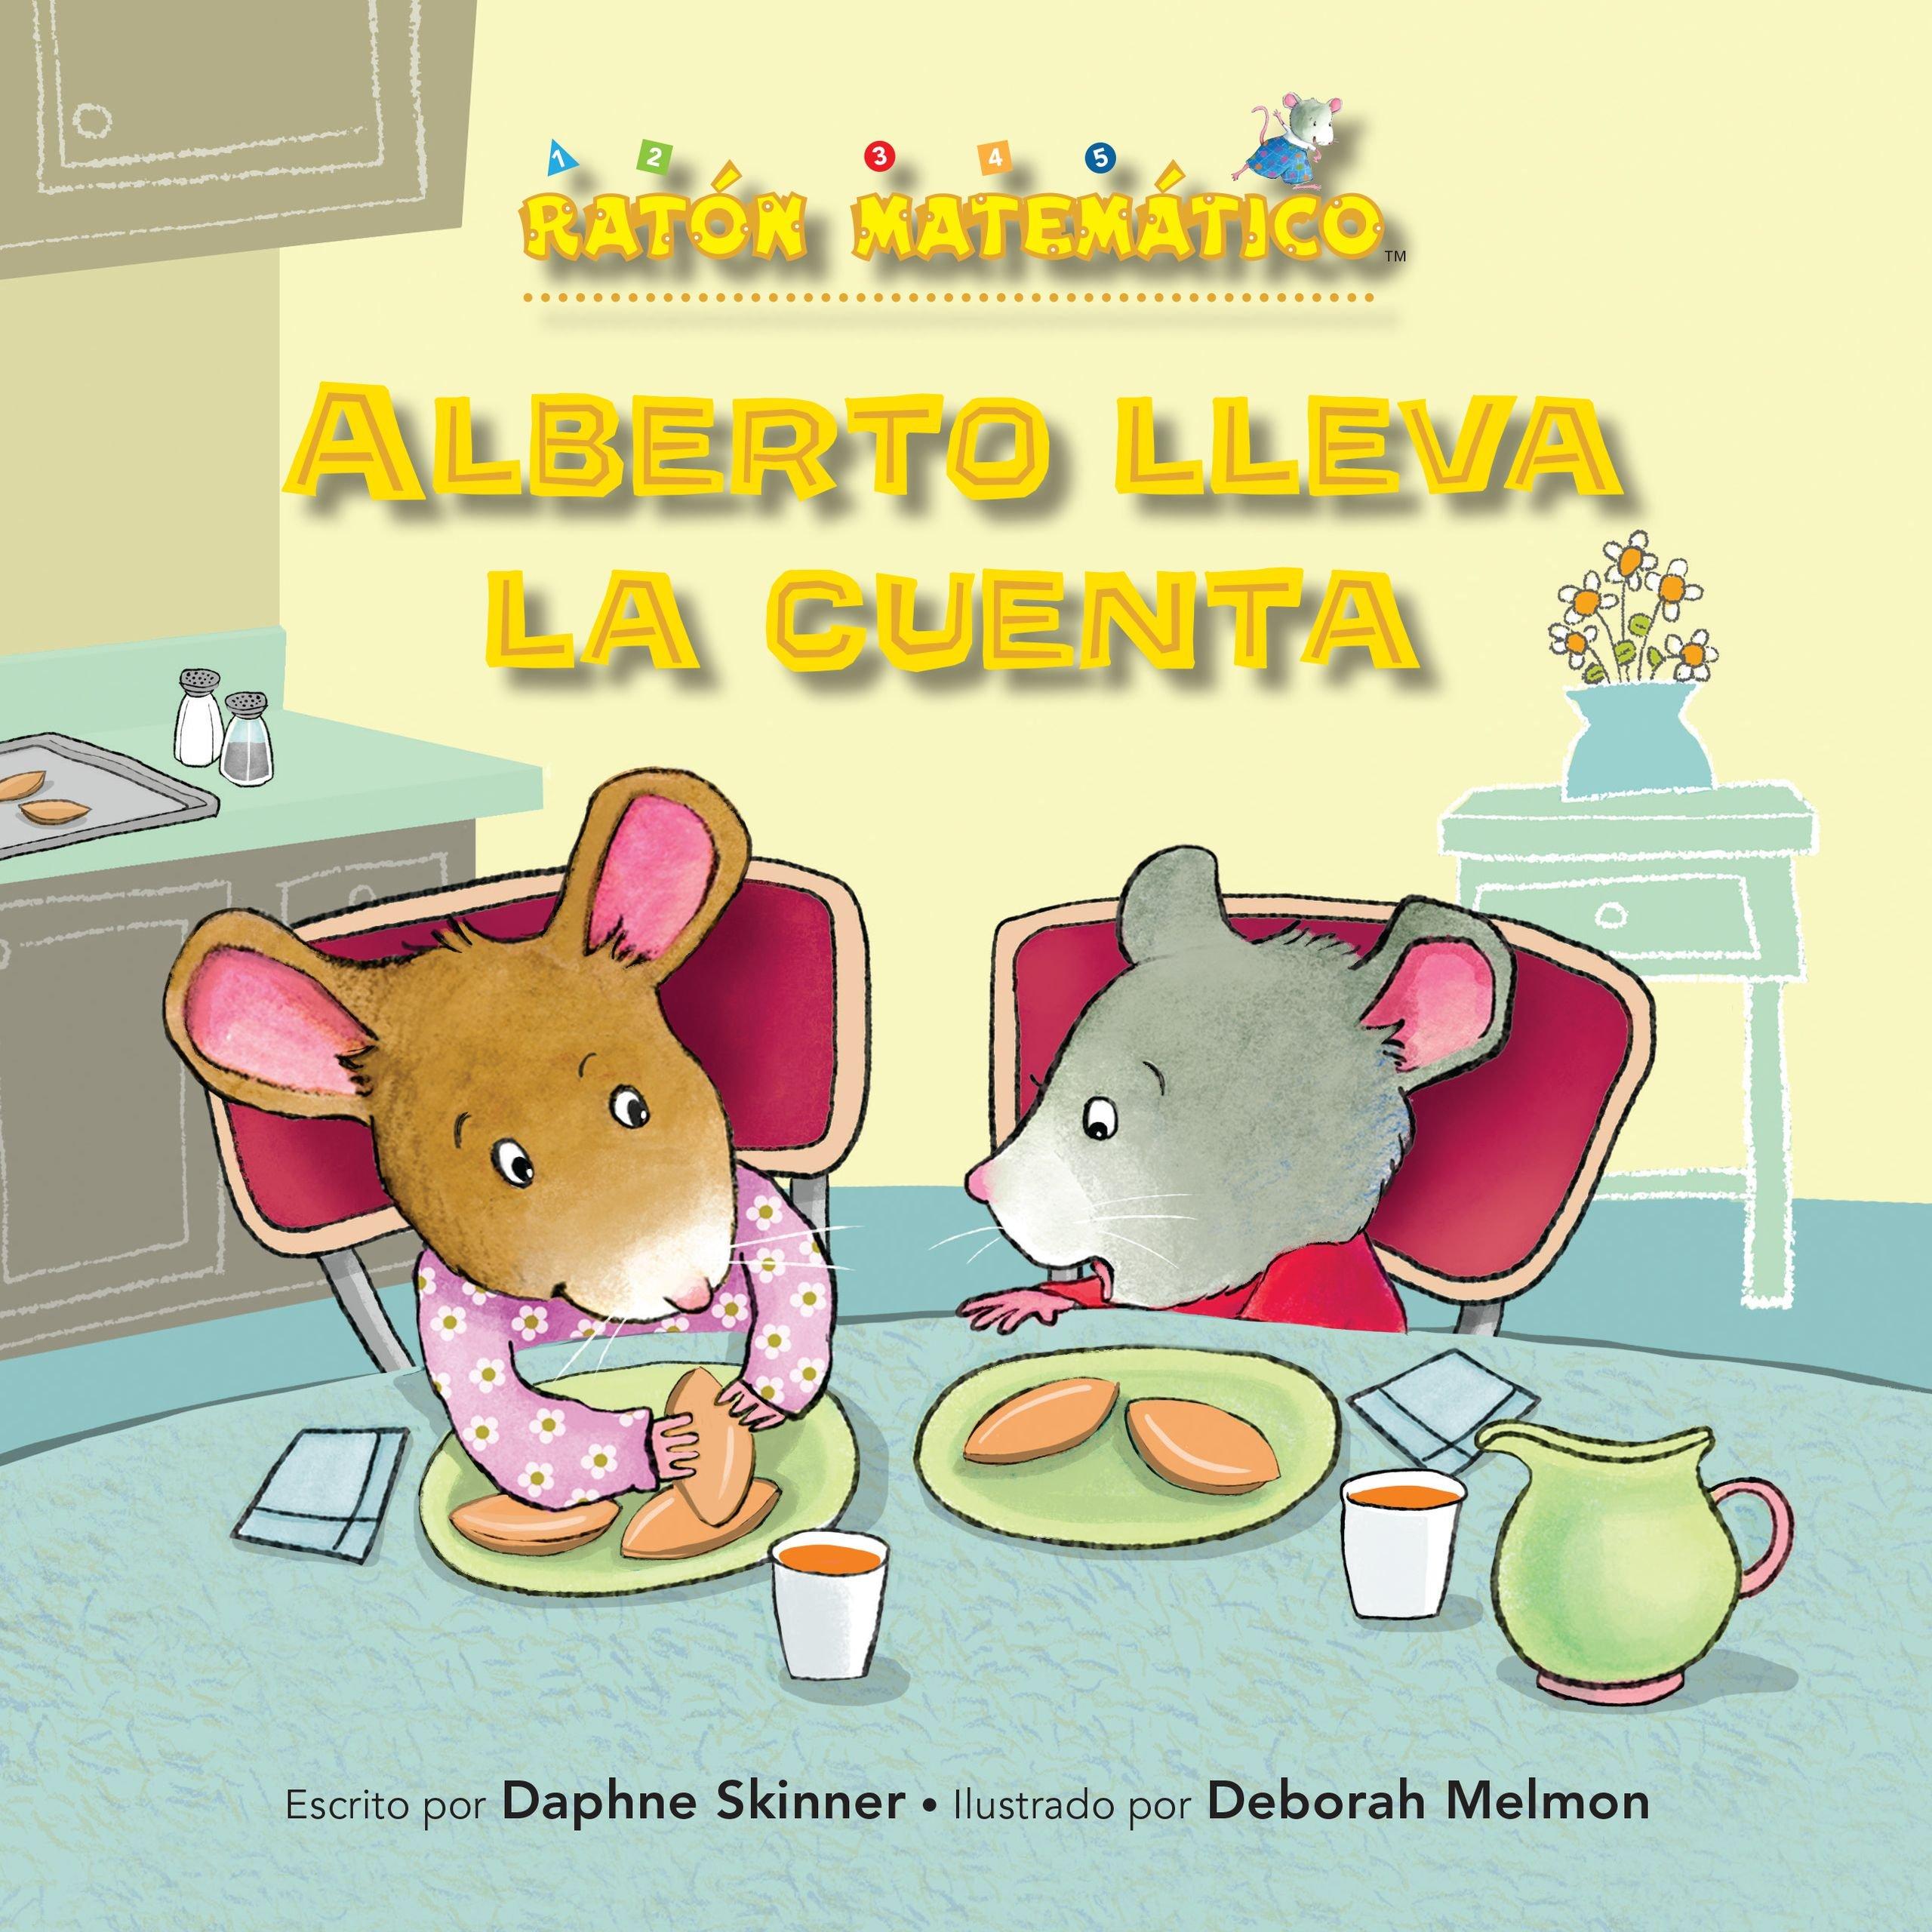 Alberto Lleva La Cuenta (Albert Keeps Score): Comparar Números (Comparing Numbers) (Ratón Matemático (Mouse Math)) (Spanish Edition) (Spanish) Paperback ...